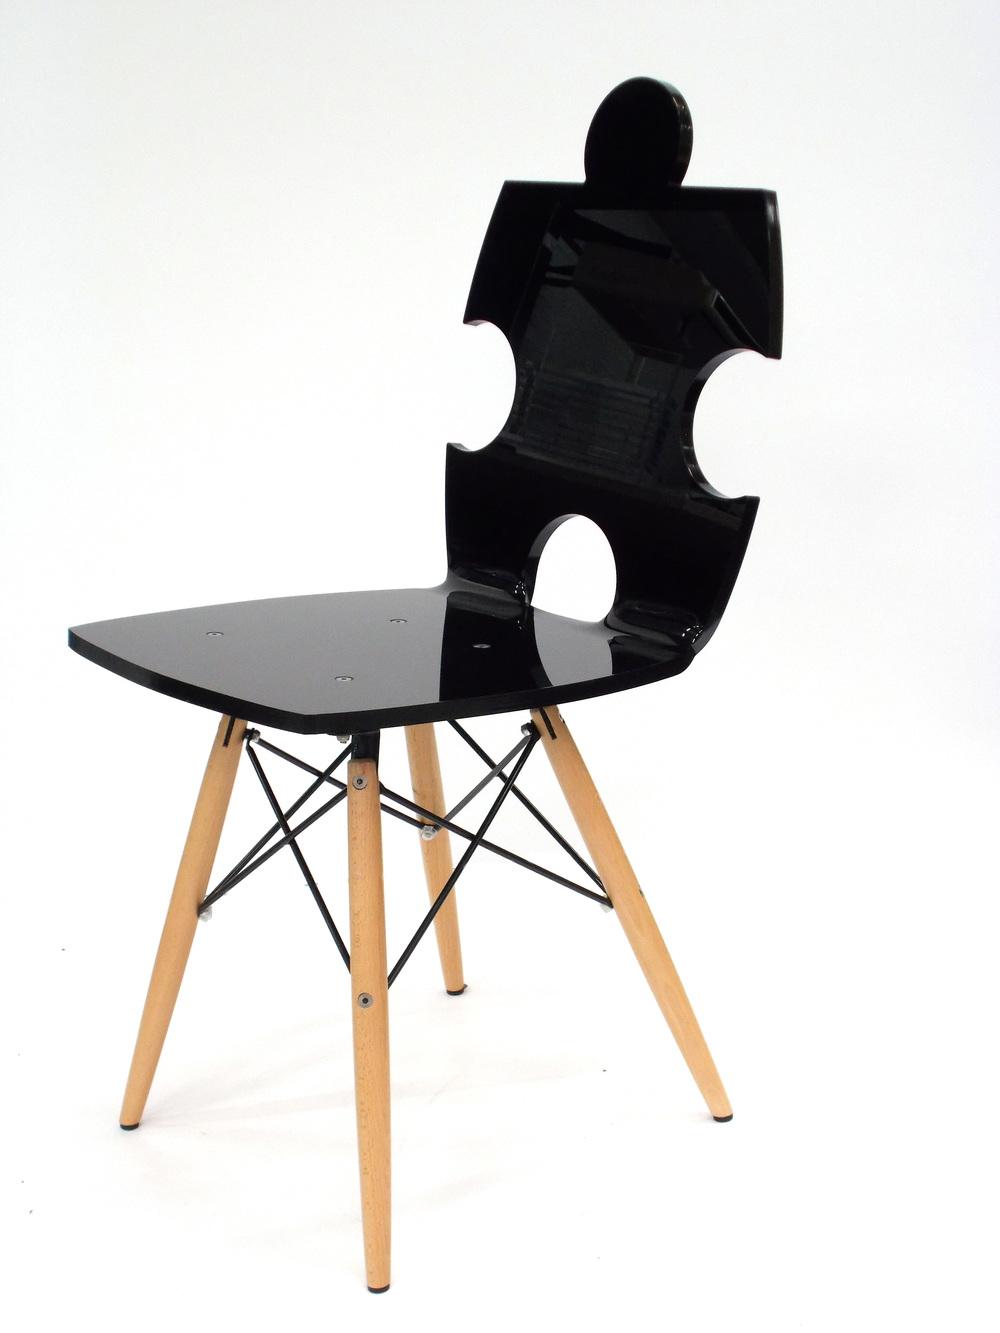 chaise puzzle pied bois 1318.jpg